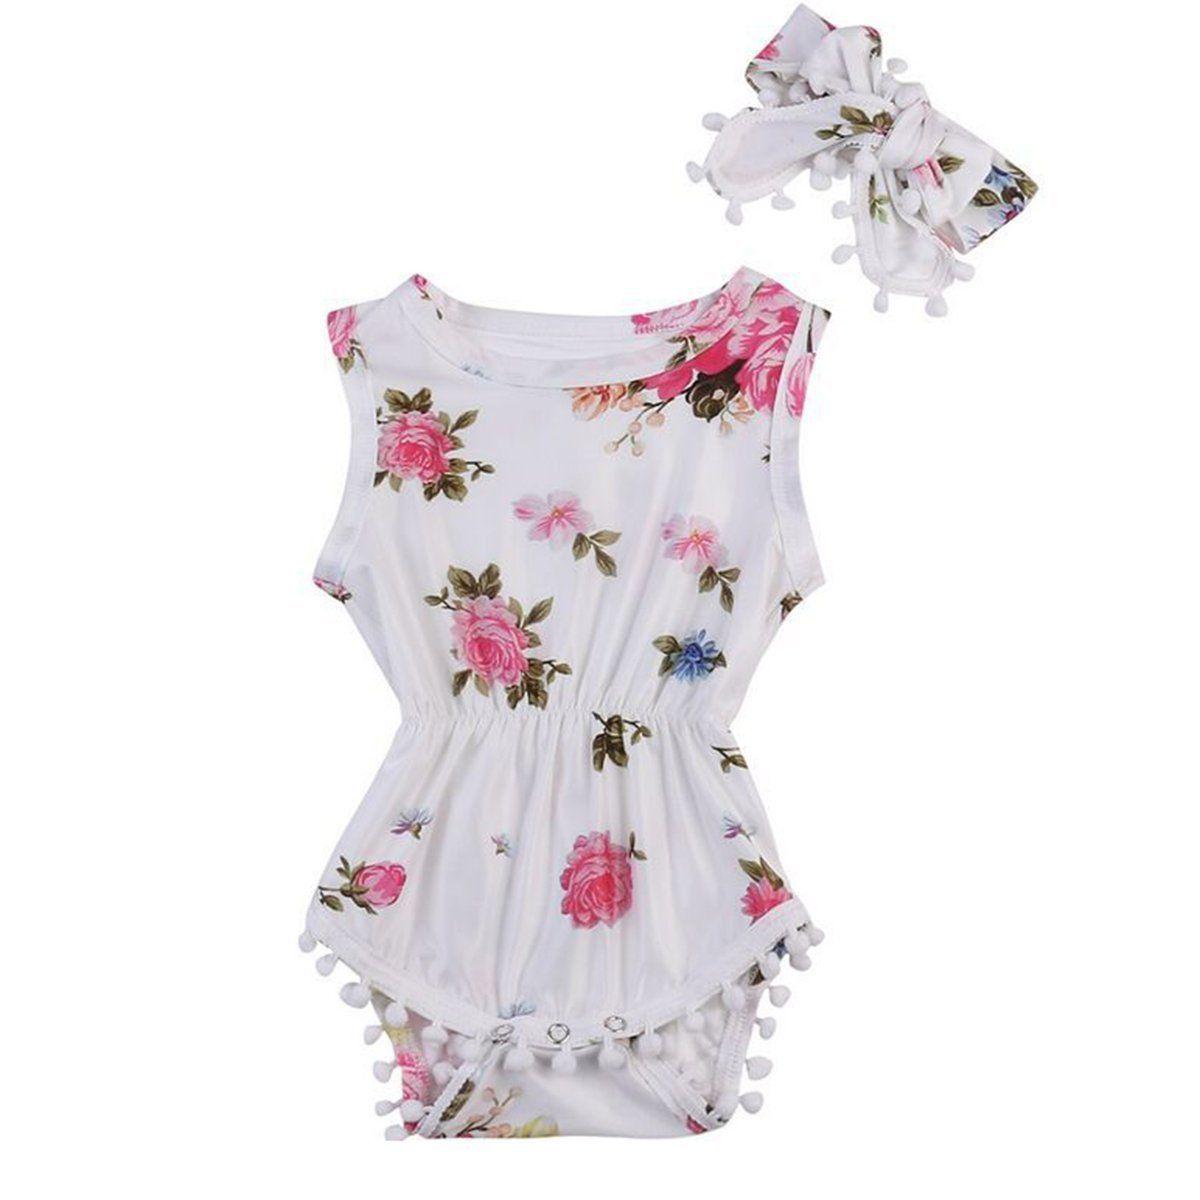 9cd54eb78 Newborn Infant Baby Girl Floral Romper Bodysuit Jumpsuit Headband ...